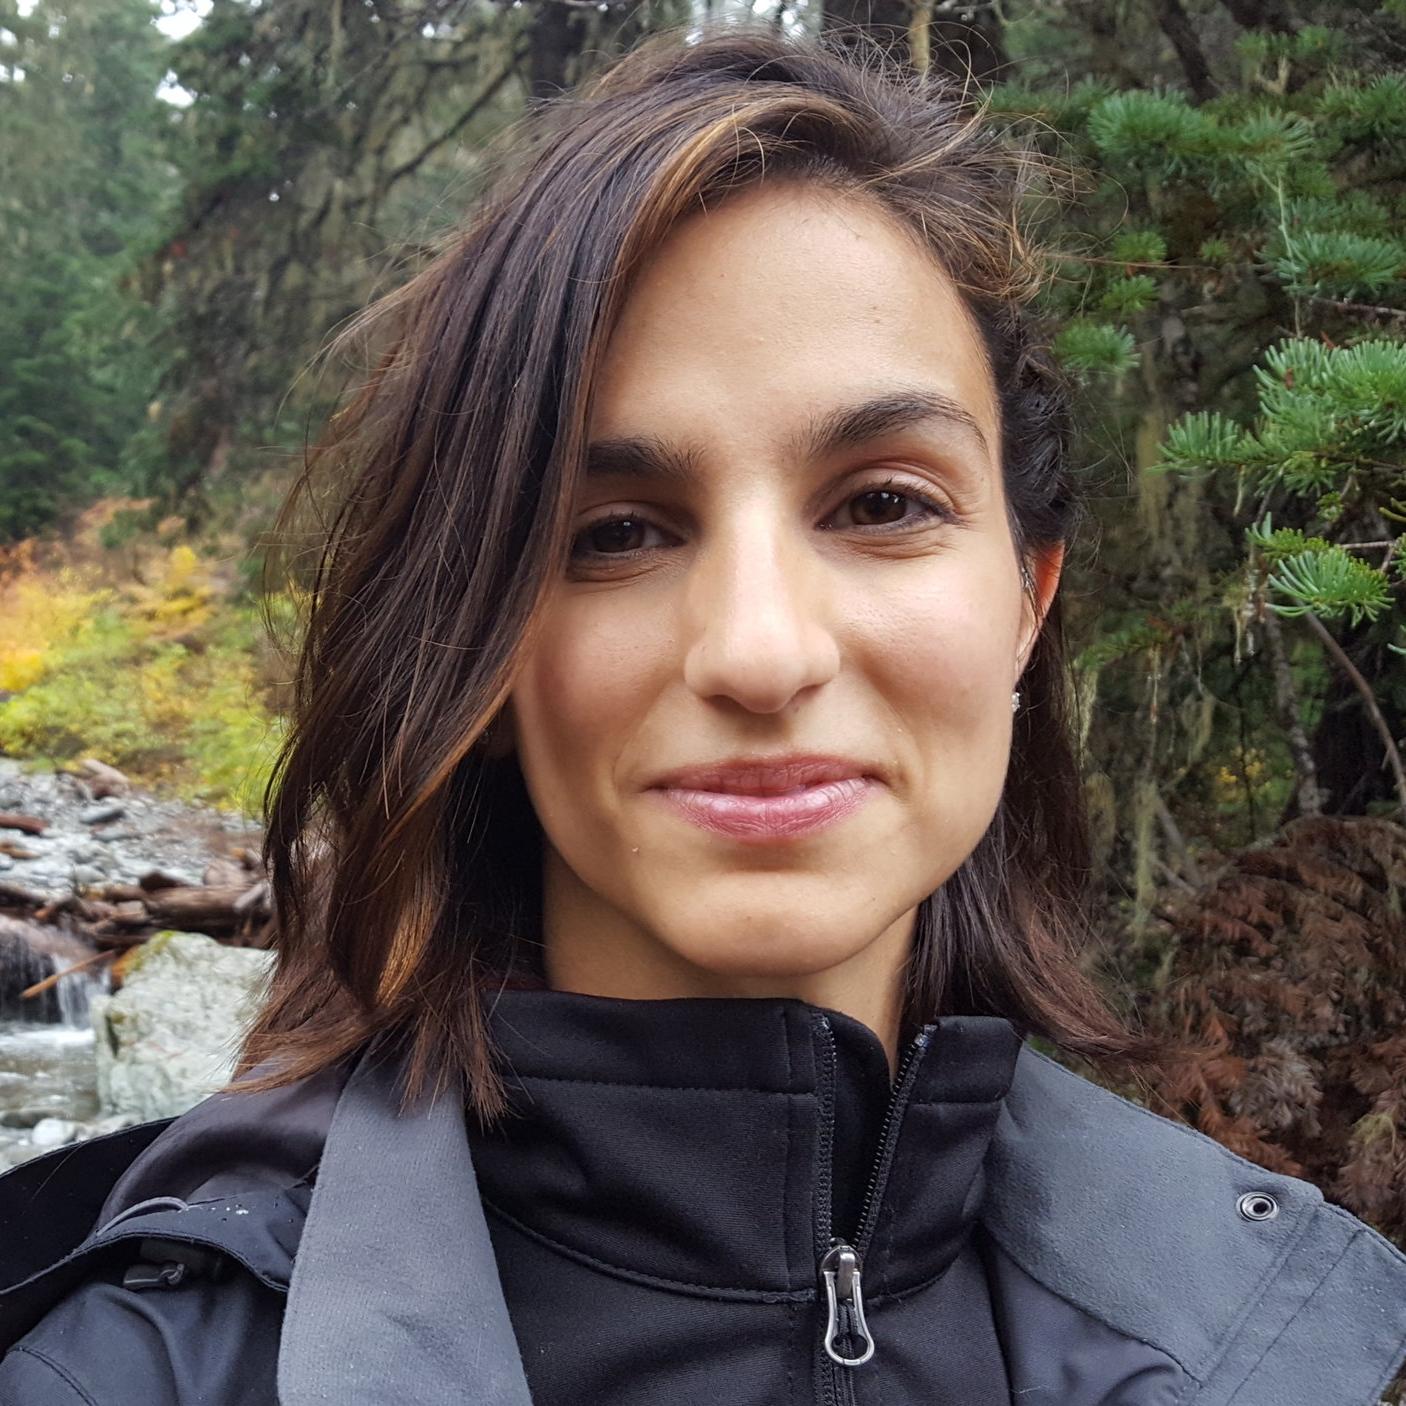 Ellen-Zouras-Headshot.jpg